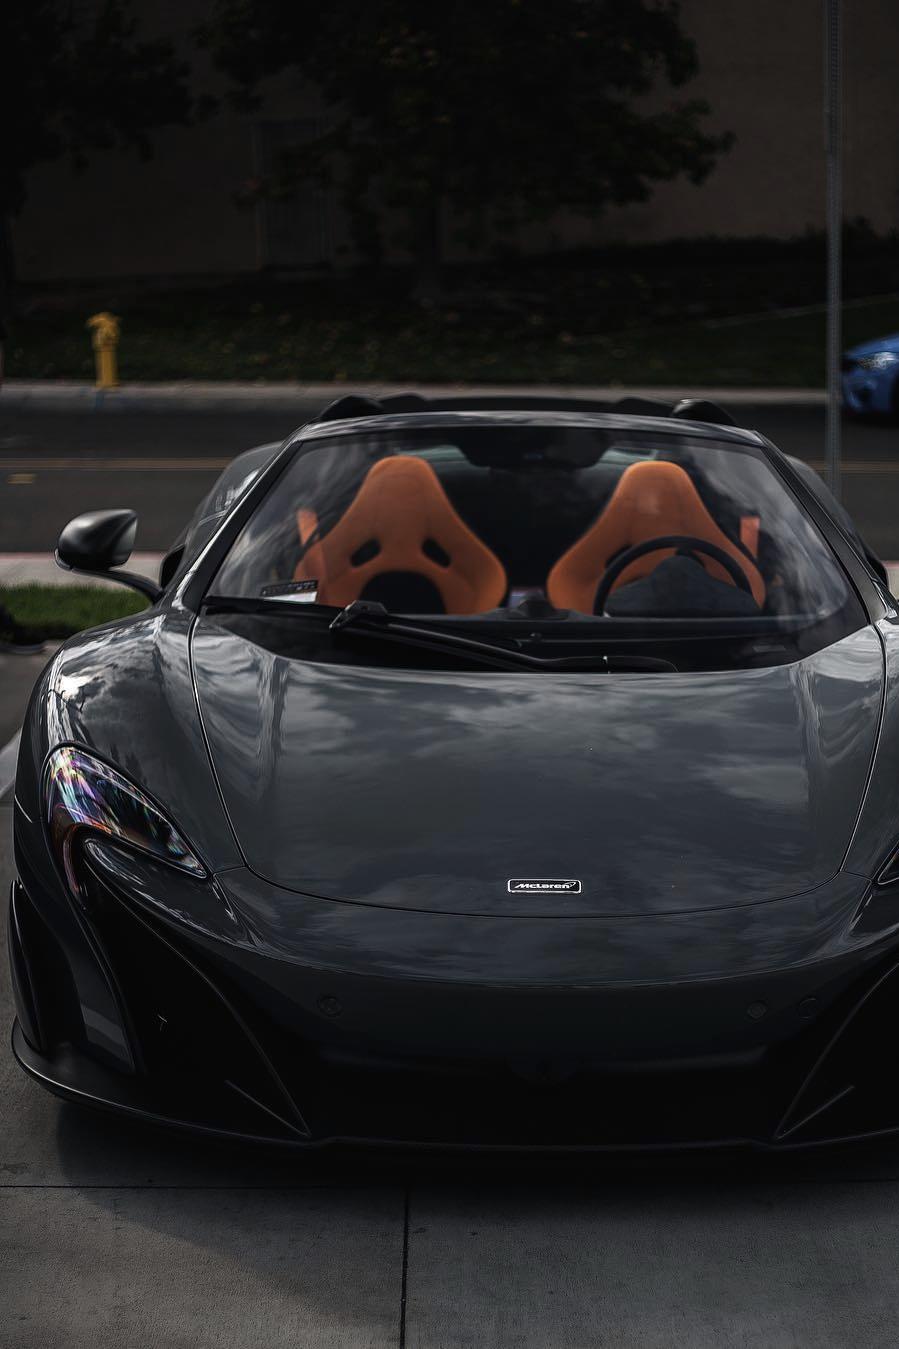 Toys car png  Pin by Rachel Bednarik on  Ultimate Cars   Pinterest  Cars